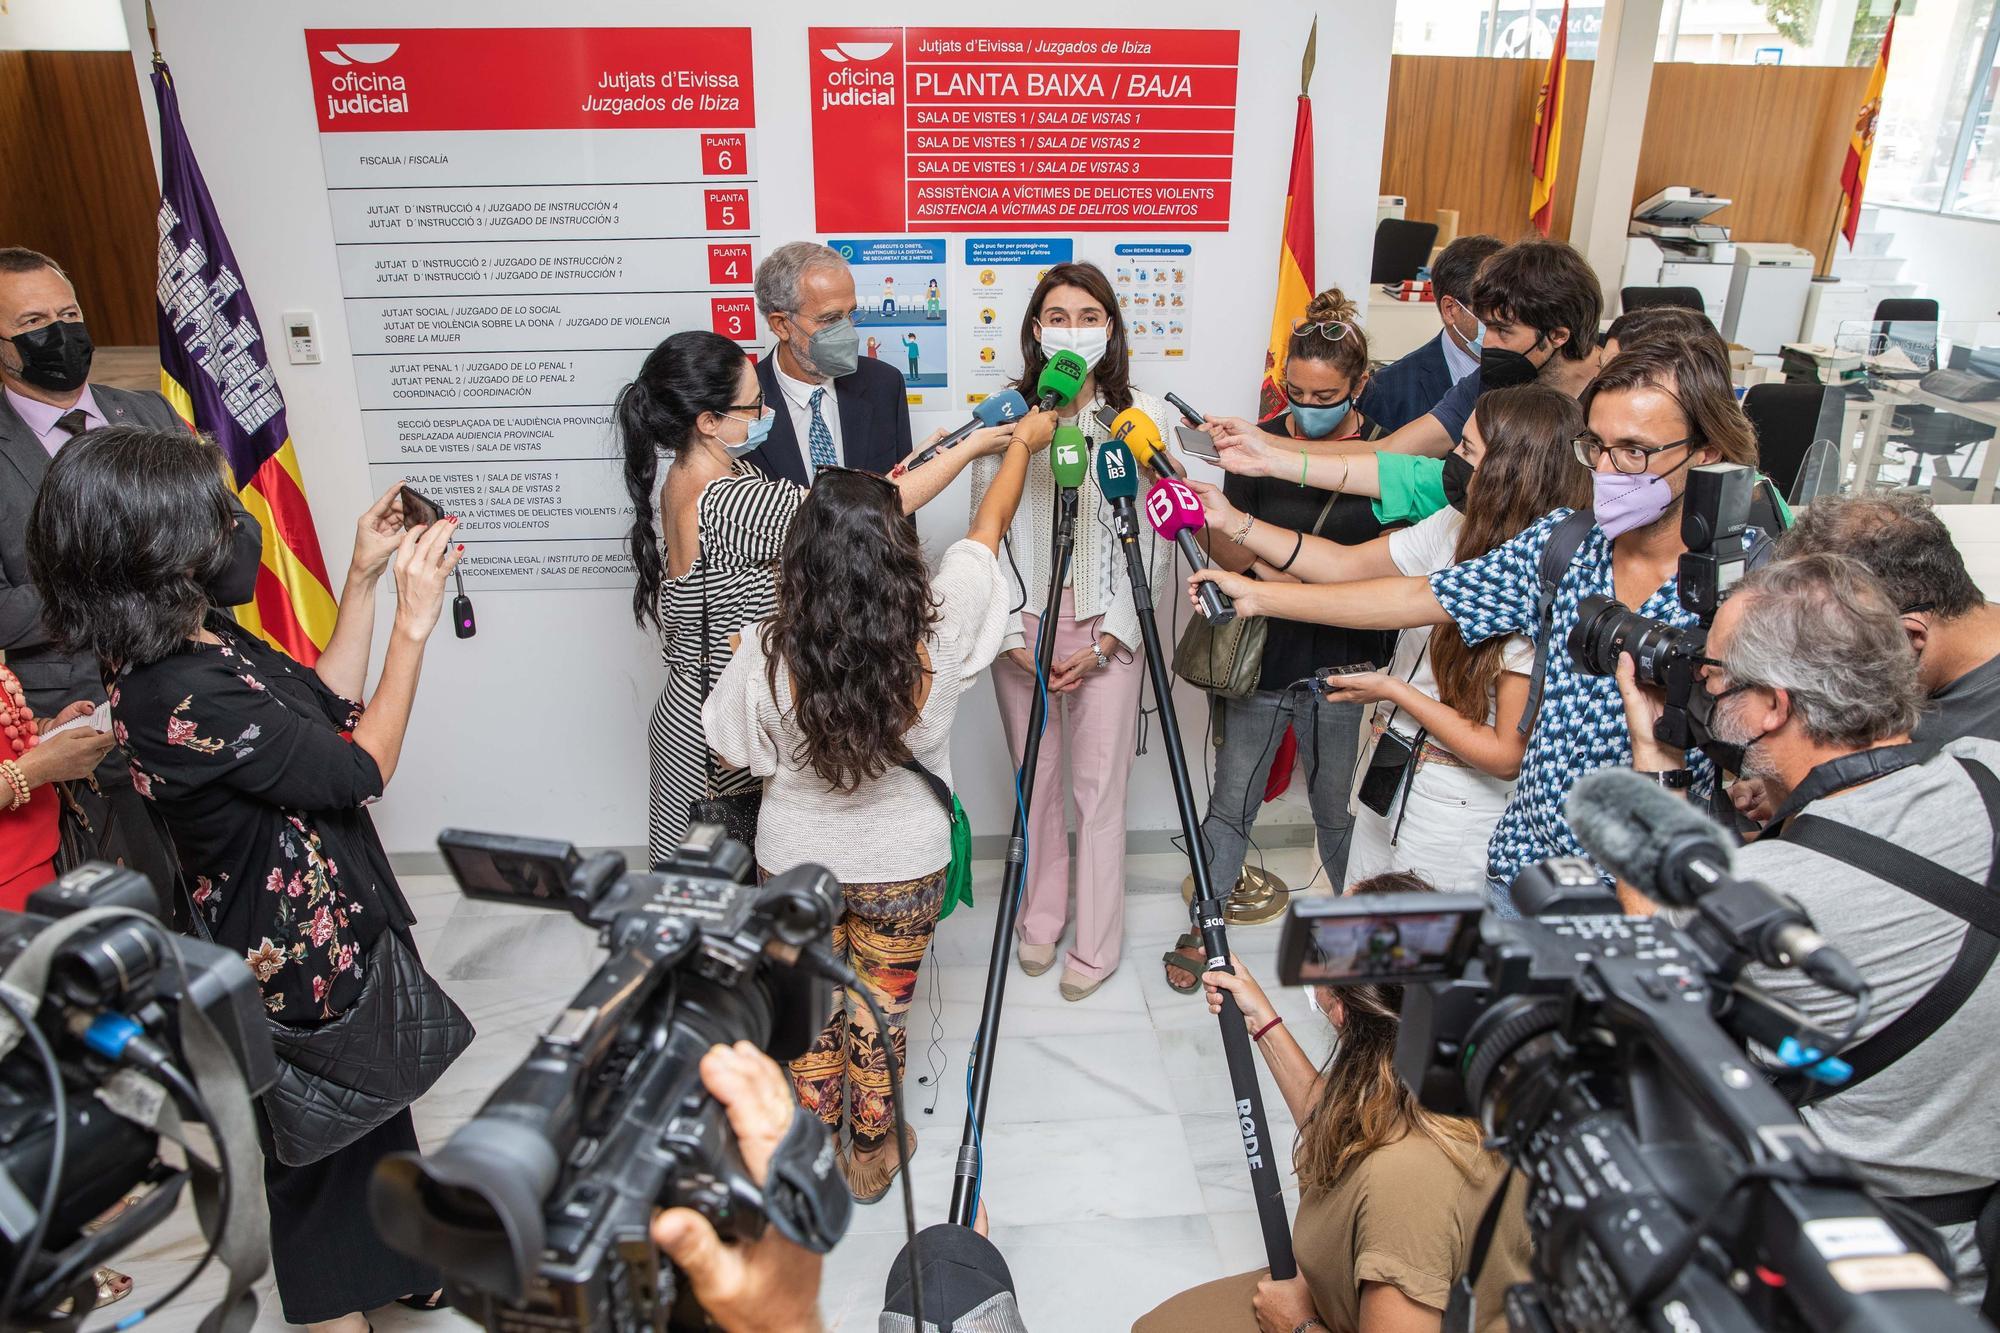 Visita de la ministra de justicia Pilar Llop a los Juzgados de Ibiza